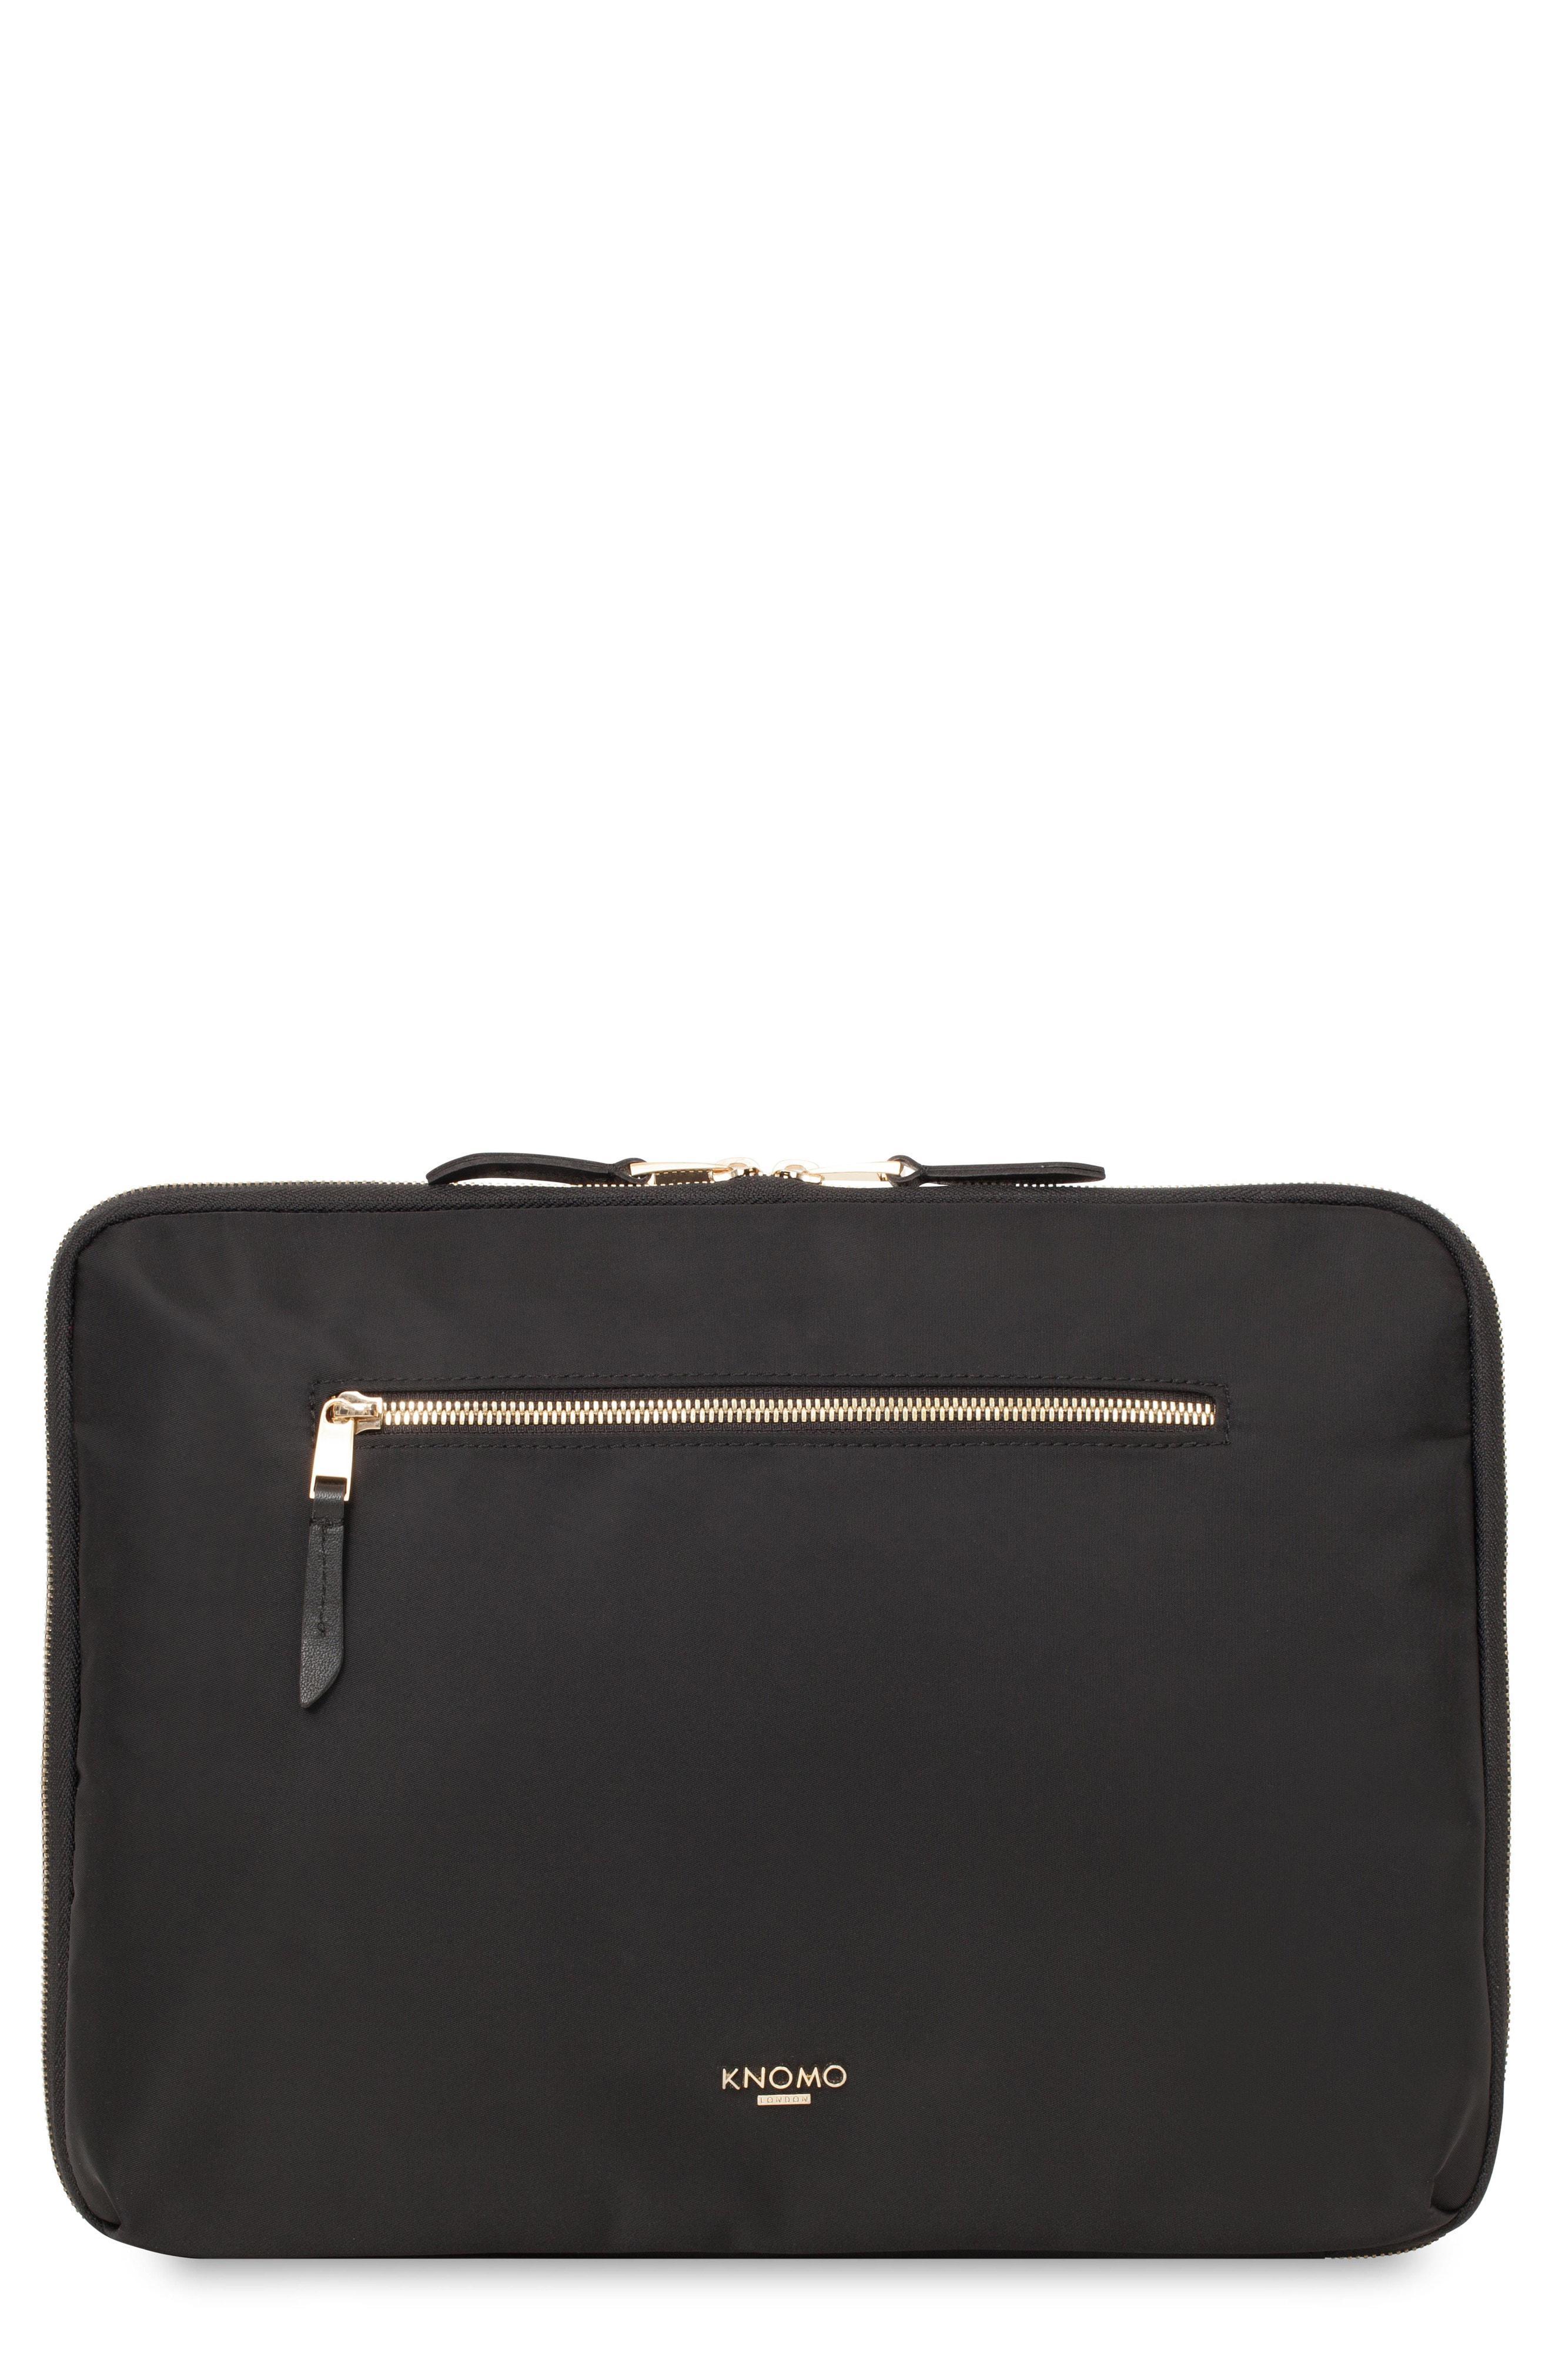 d64c949596 Lyst - Knomo Mayfair 12-inch Portfolio in Black for Men